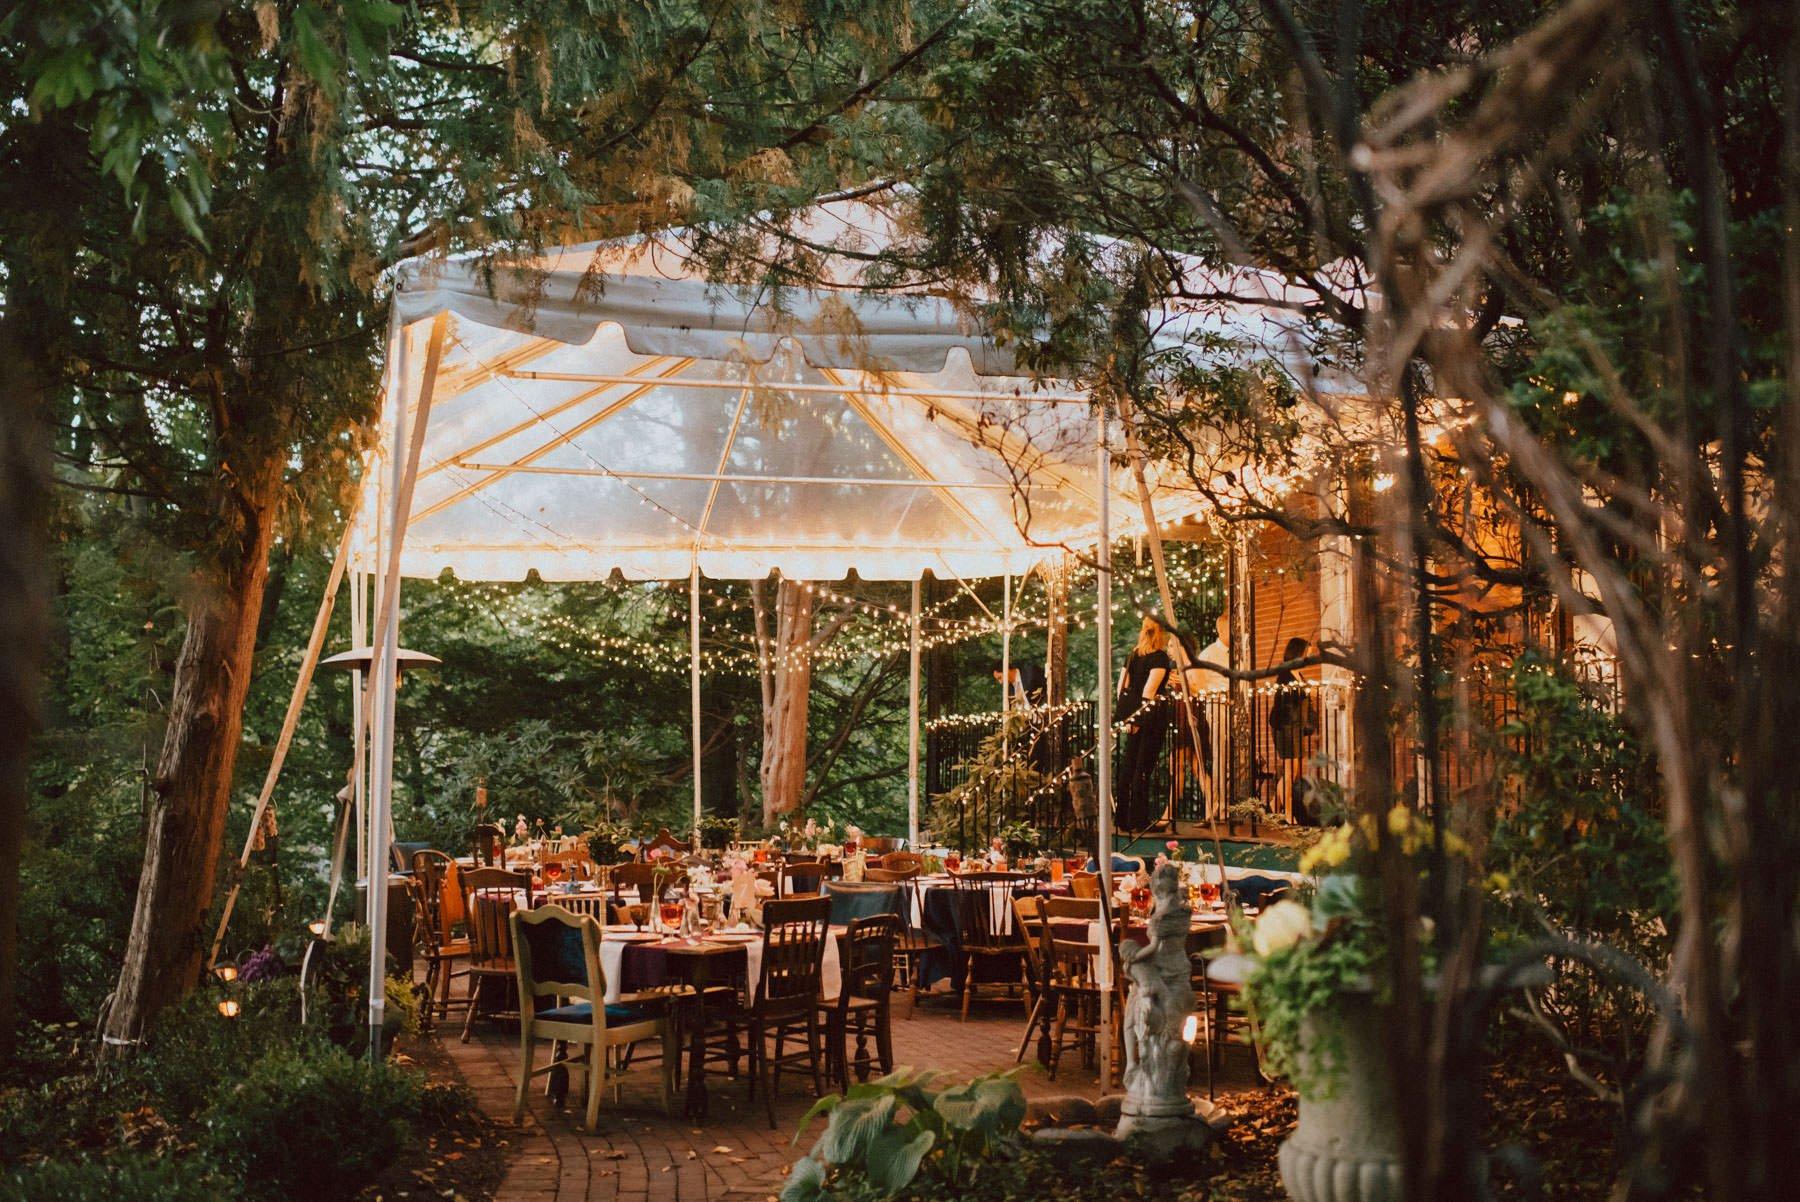 faunbrook-bed-and-breakfast-wedding-138.jpg